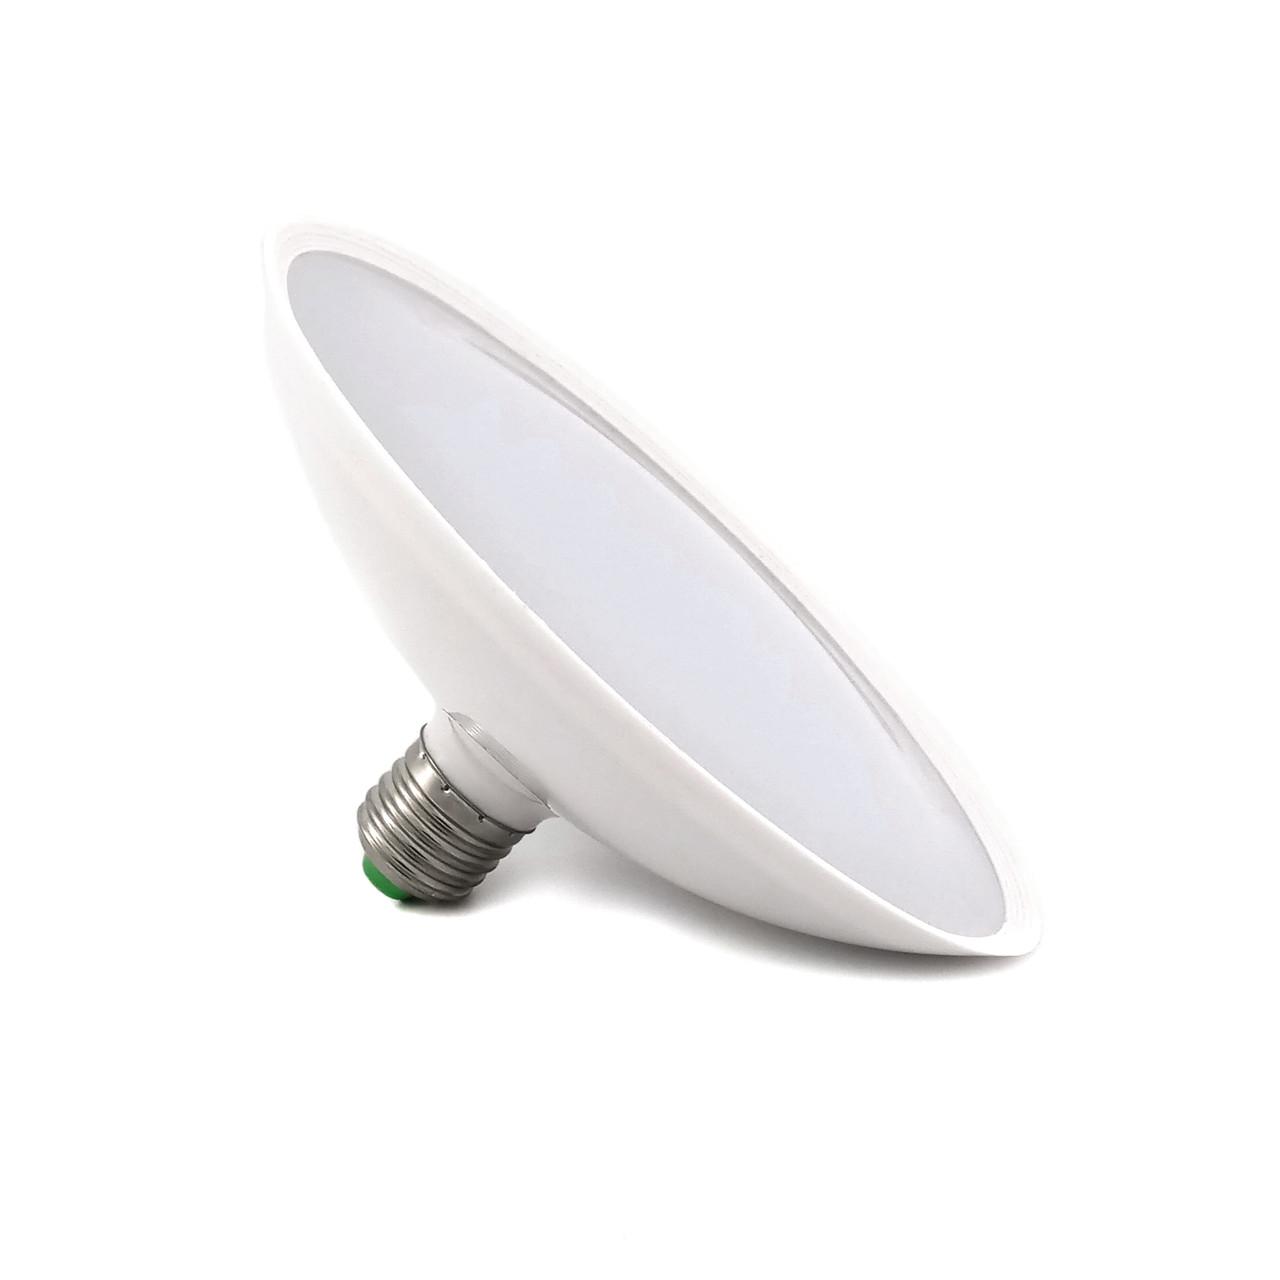 Светодиодная лампа Horoz Electric UFO R-175 15W E27 4200K (Рефлектор)